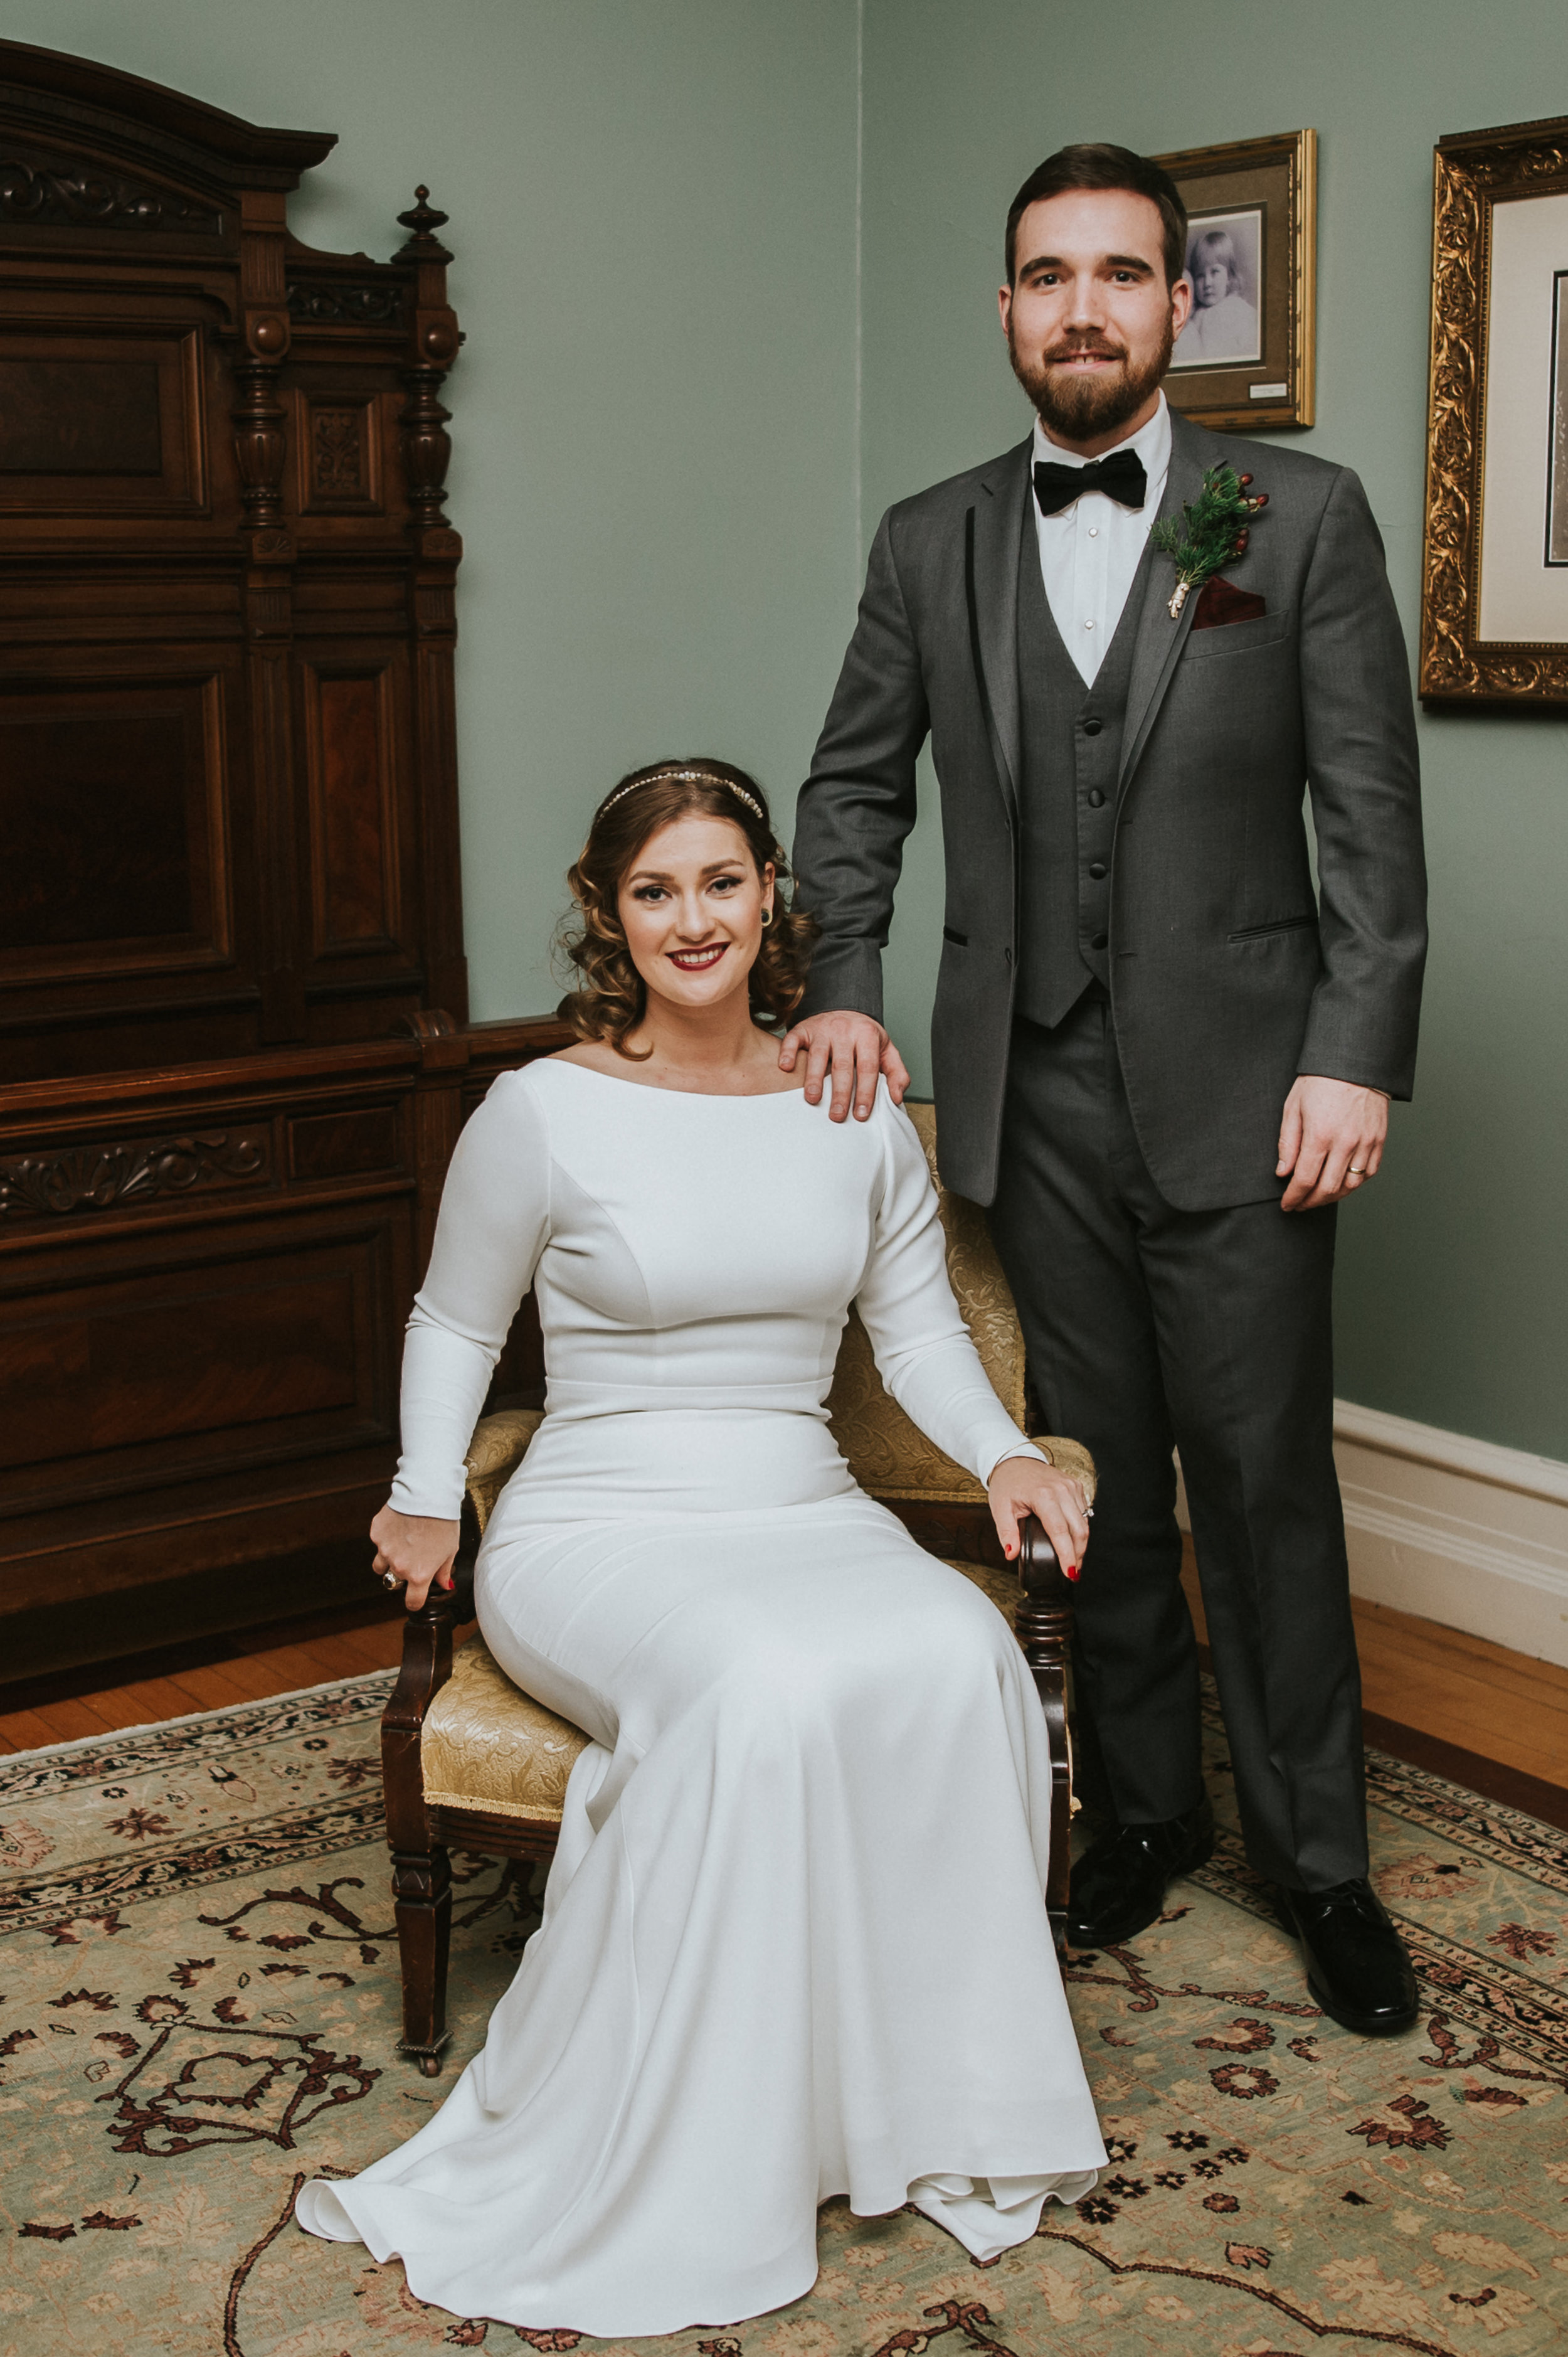 Cairnwood-Estate-Amelia-and-Patrick-Wedding-805.jpg